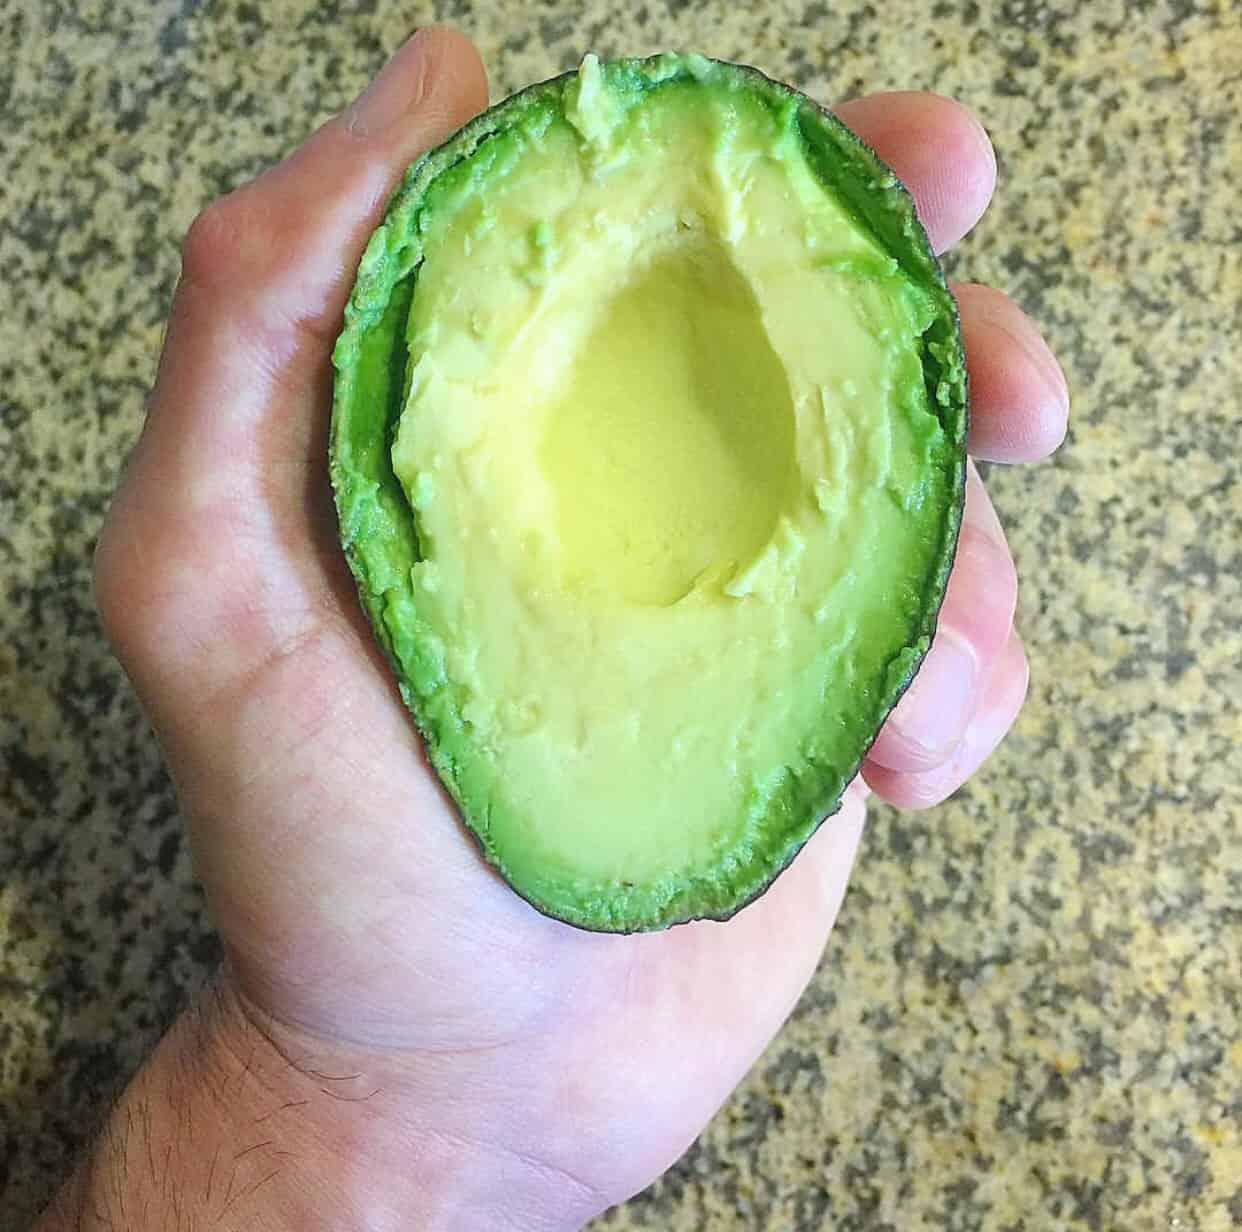 healthy grocery list - avocado